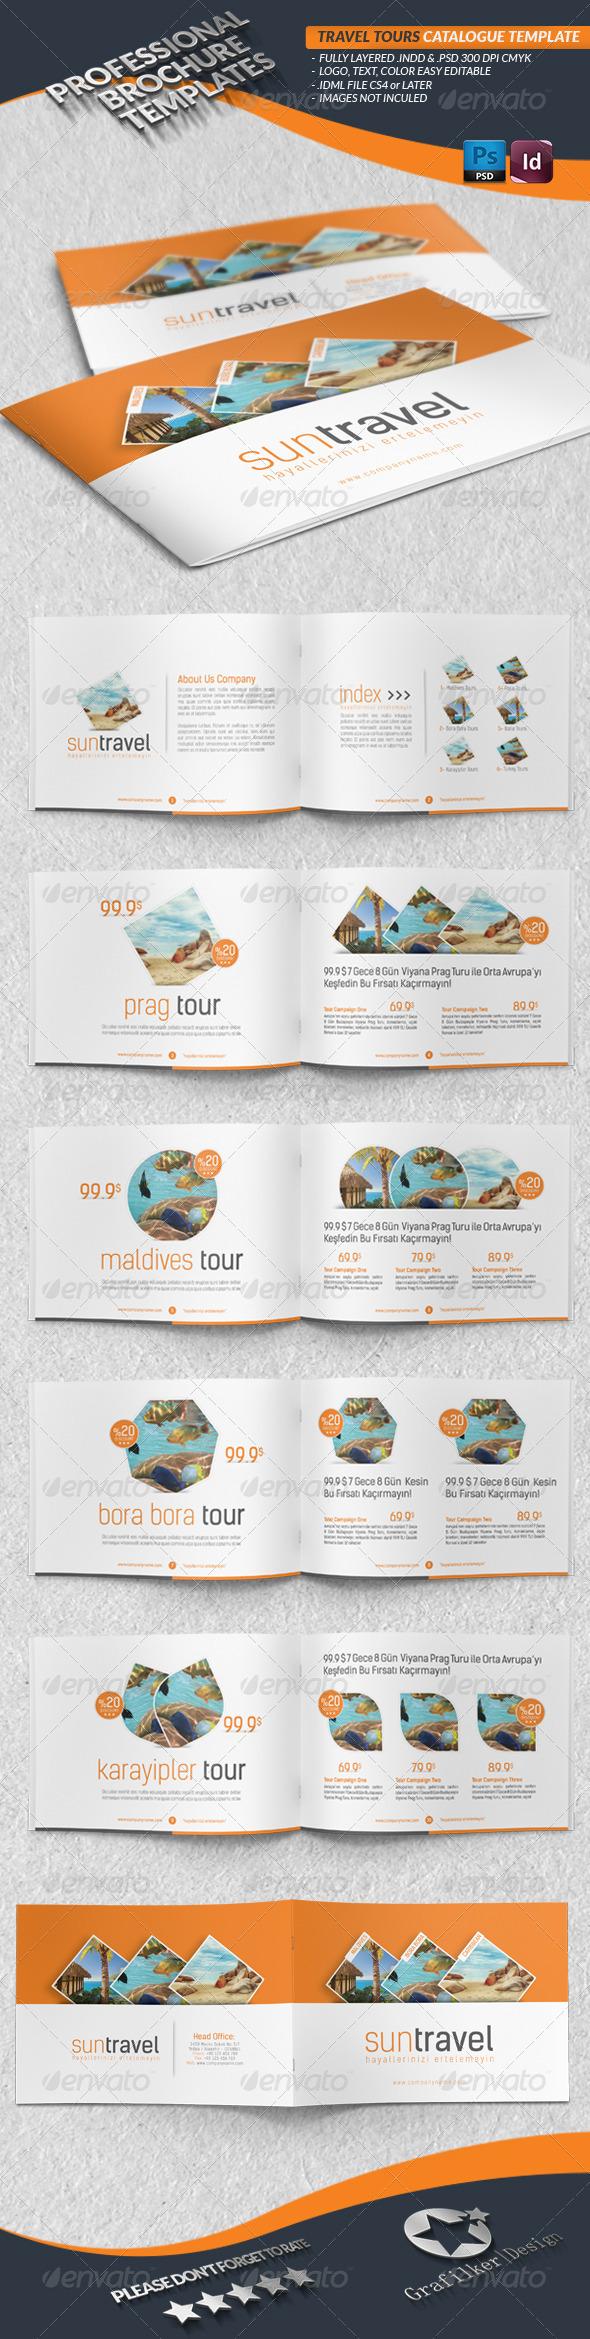 Travel Tours Catalogue Template